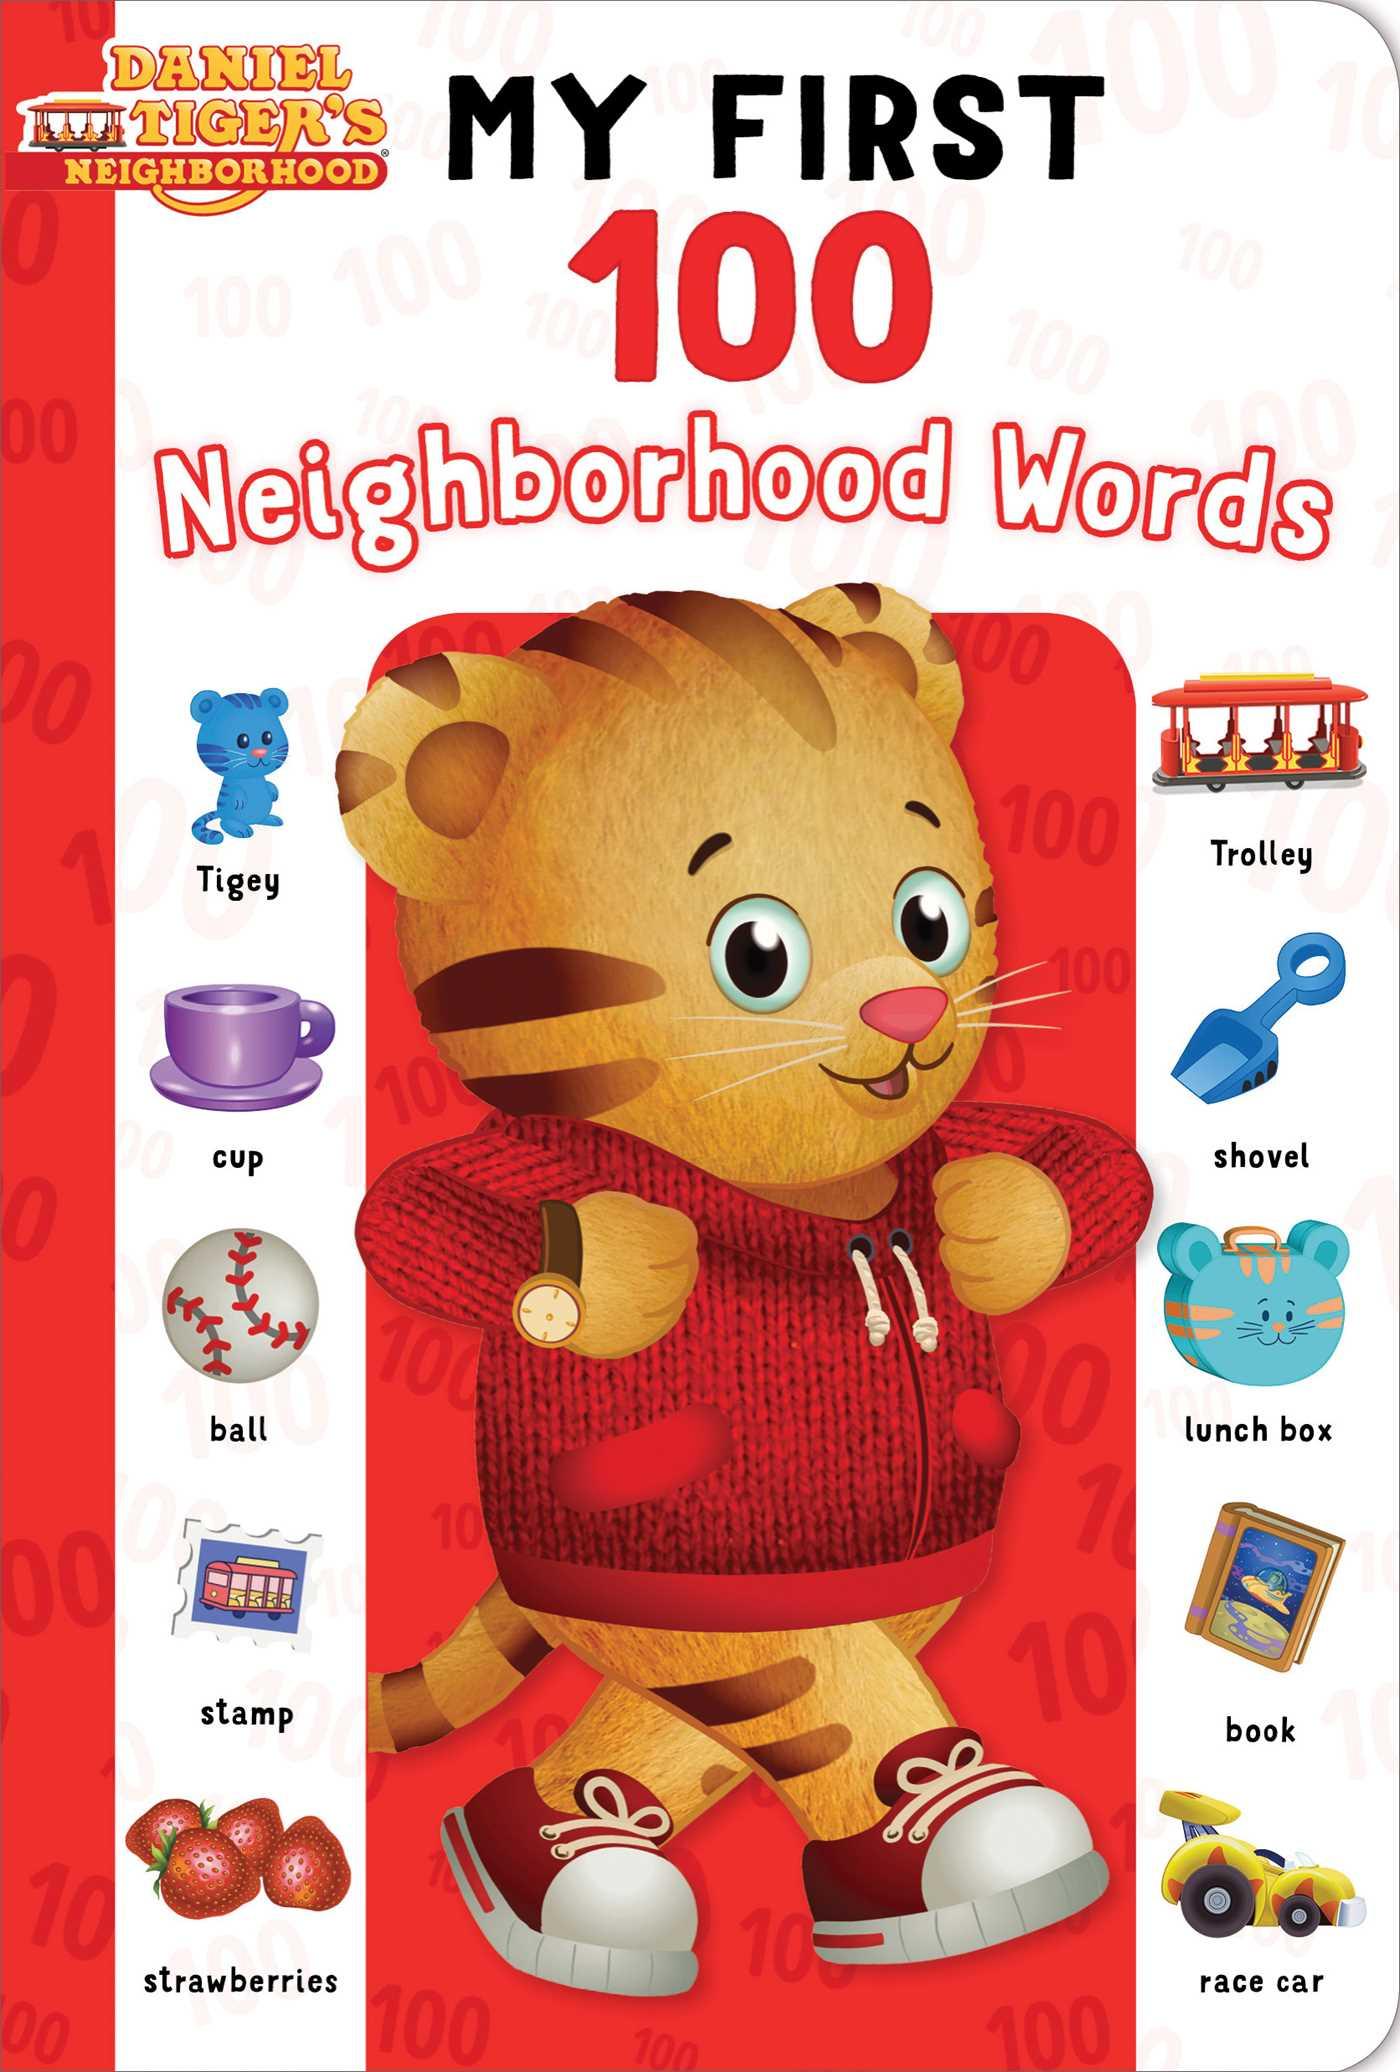 My first 100 neighborhood words 9781534425262 hr